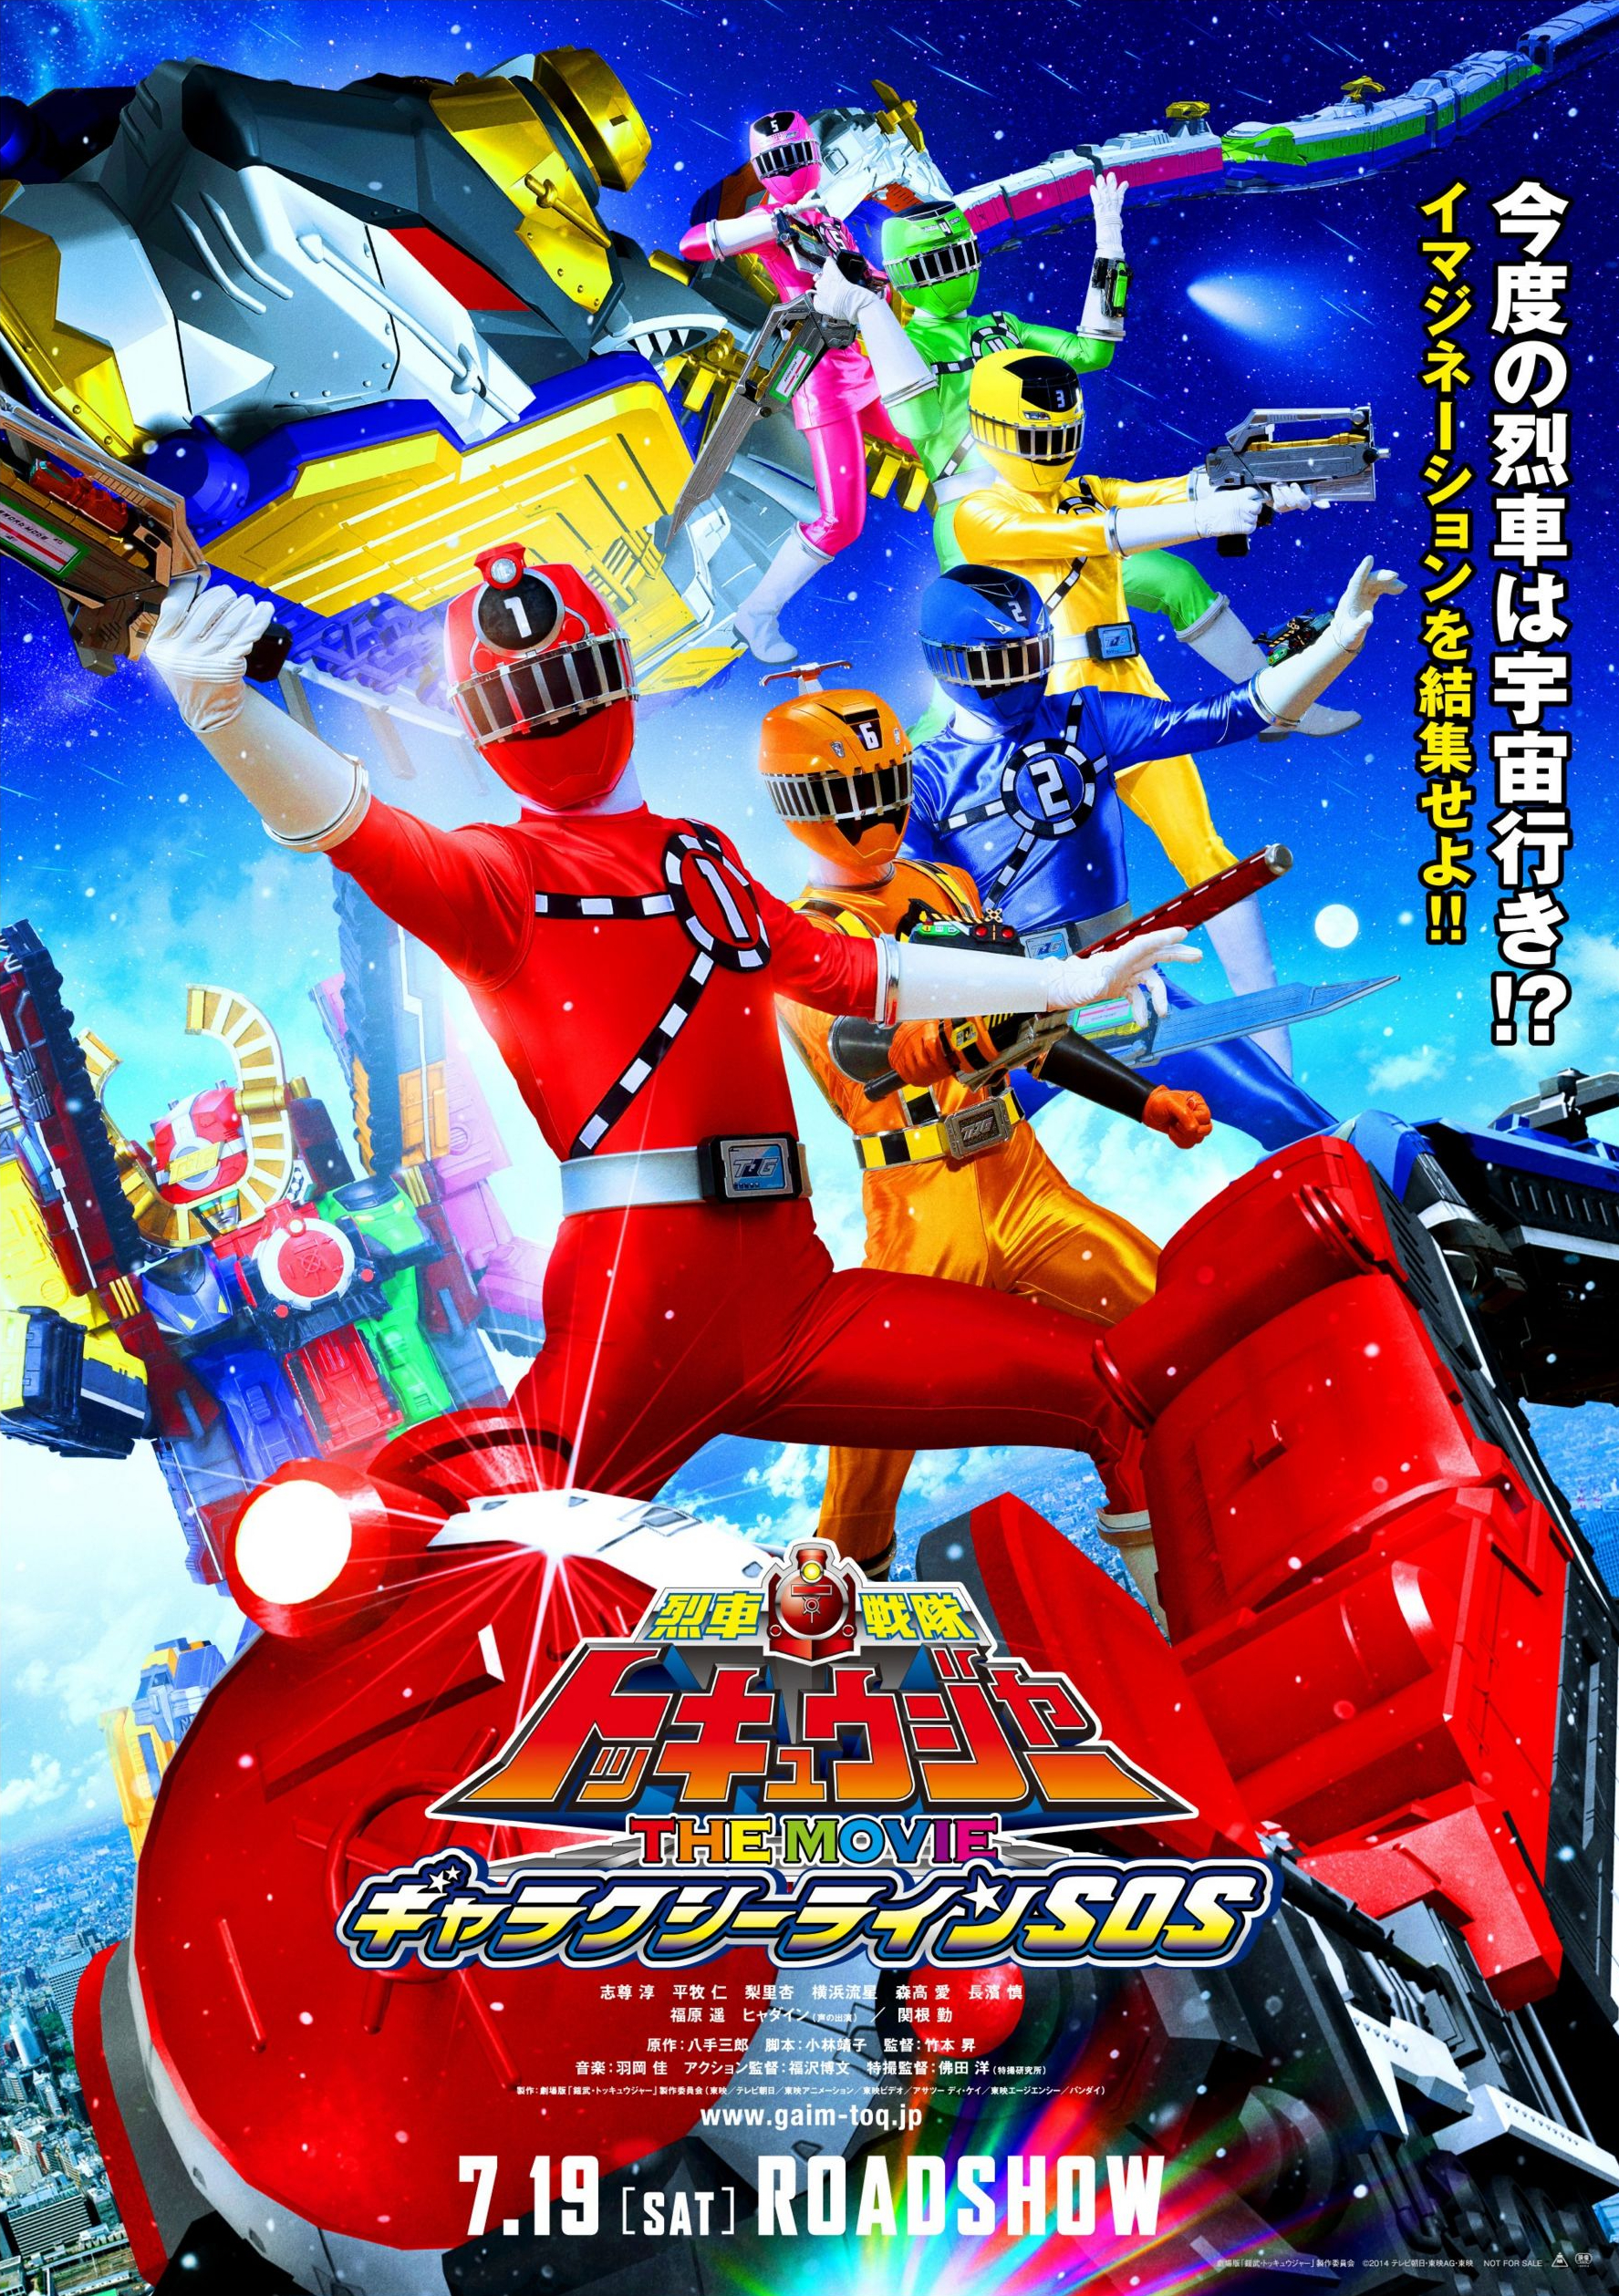 File:Ressha Sentai Toqger The Movie.png